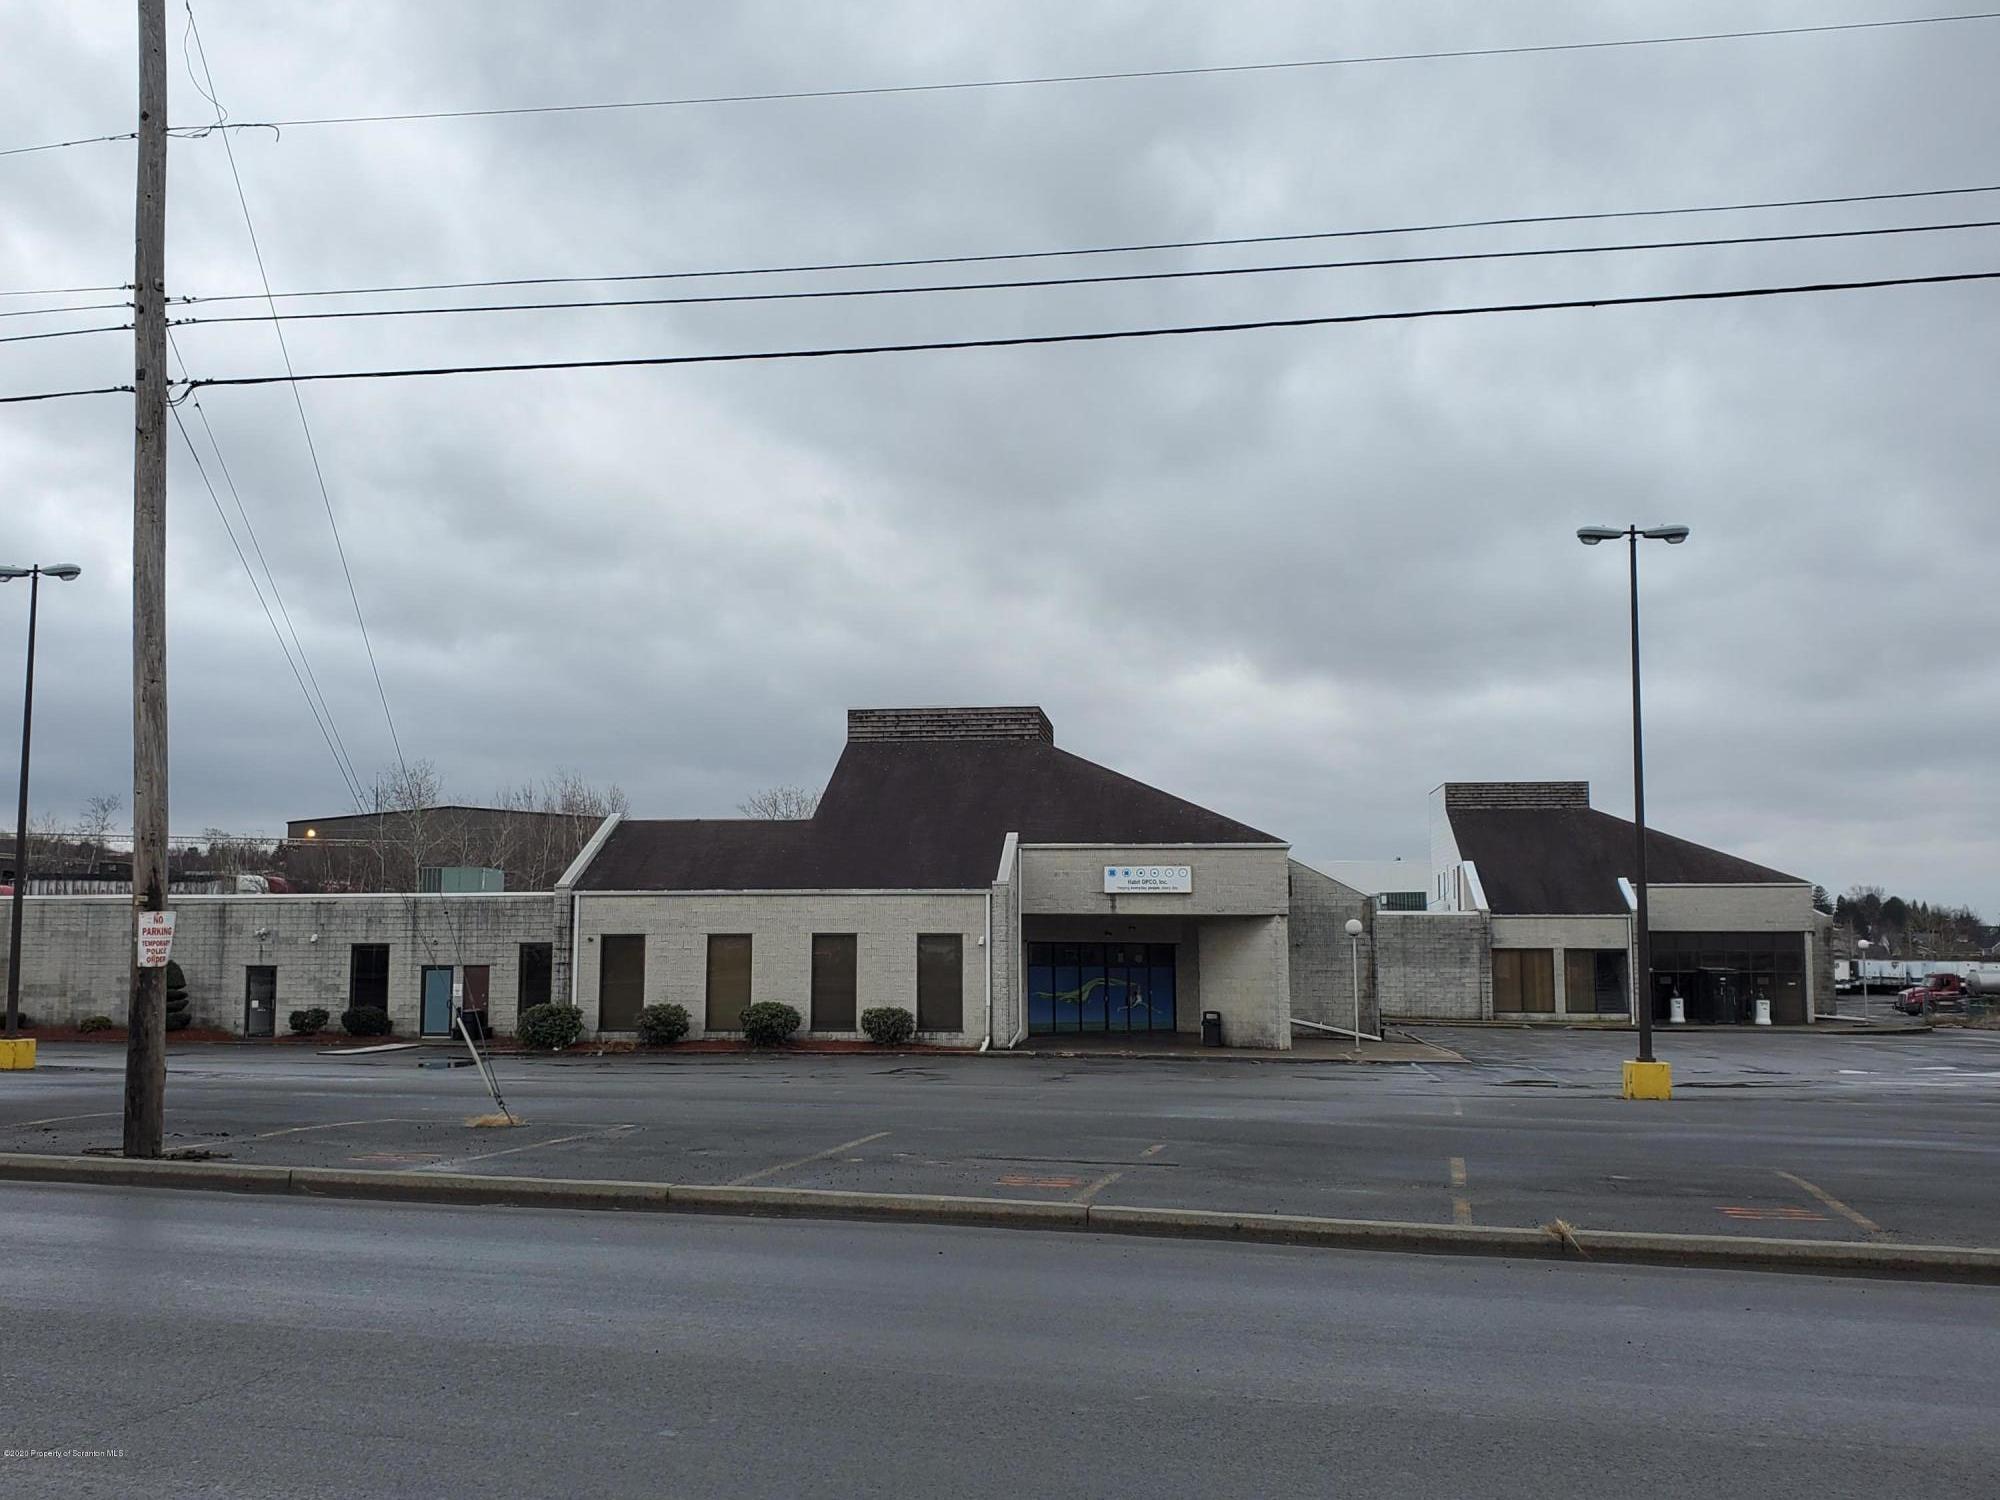 116 Monahan Ave, Dunmore, Pennsylvania 18512, ,2 BathroomsBathrooms,Commercial,For Lease,Monahan,20-154